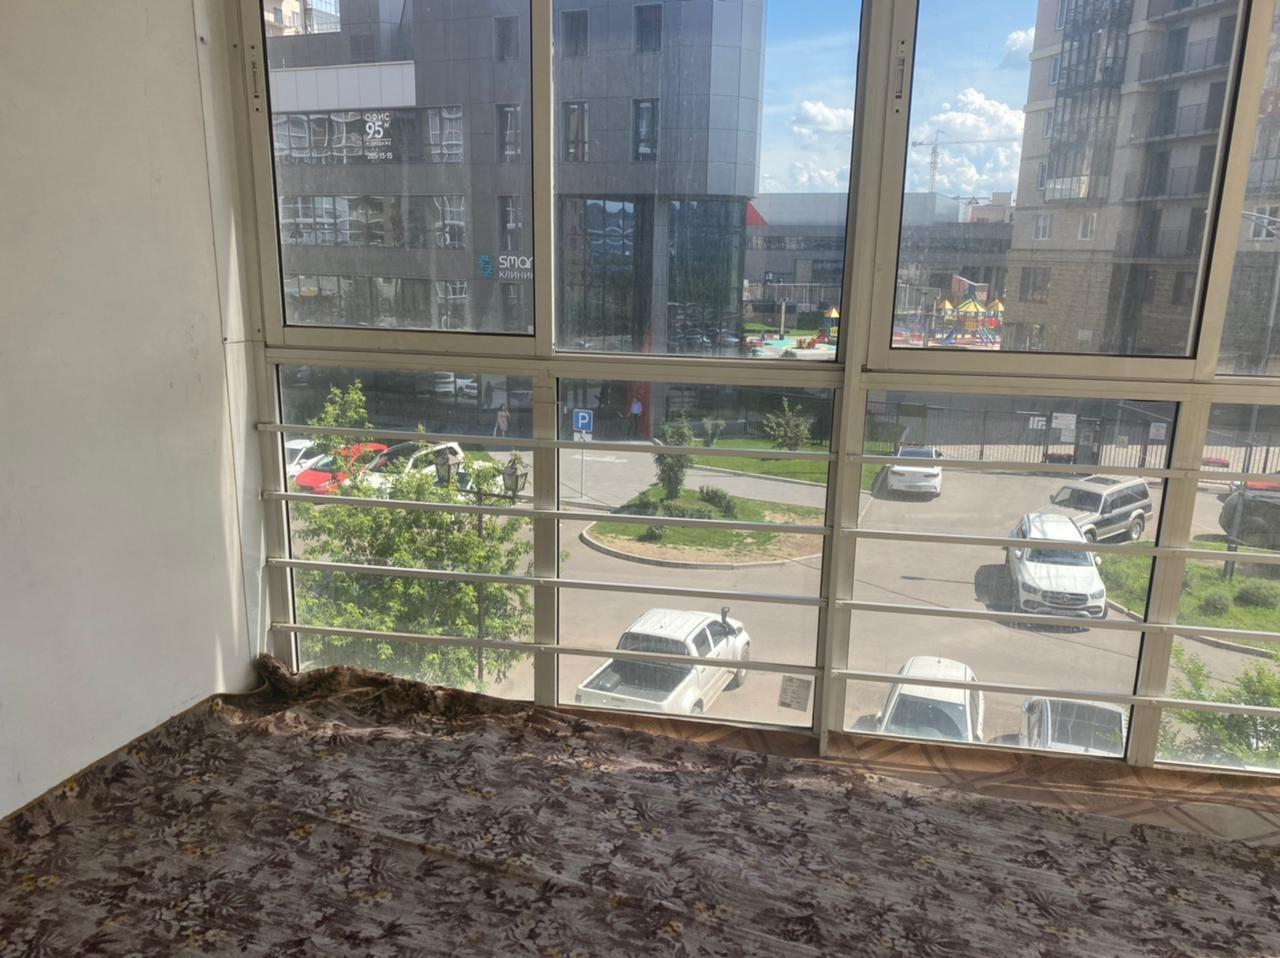 1к квартира Взлётка, микрорайон БЦ, улица Авиаторов, 25 | 18500 | аренда в Красноярске фото 5